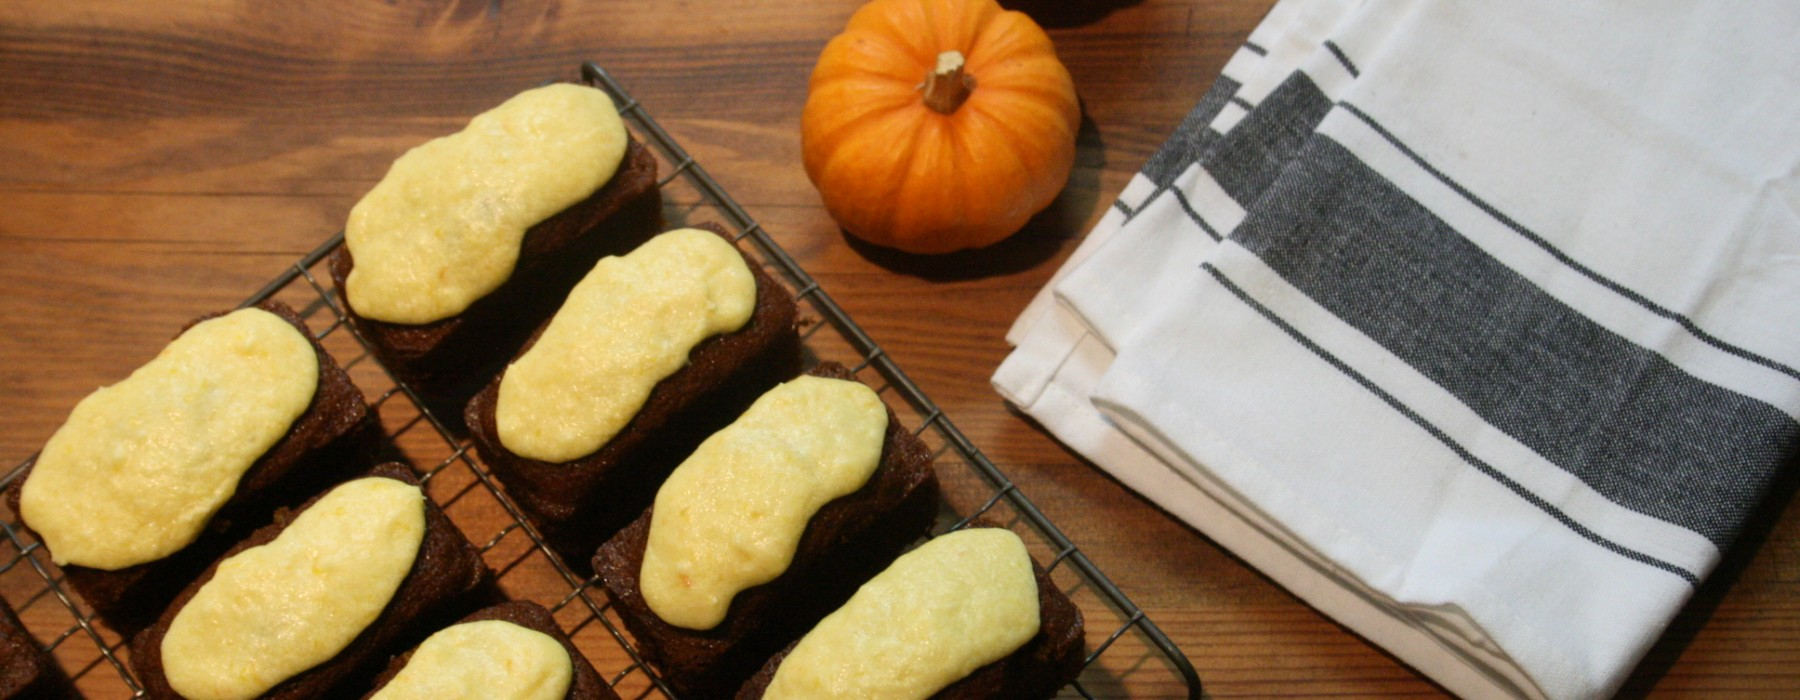 Homegrown and Homemade: Pumpkin Cakes